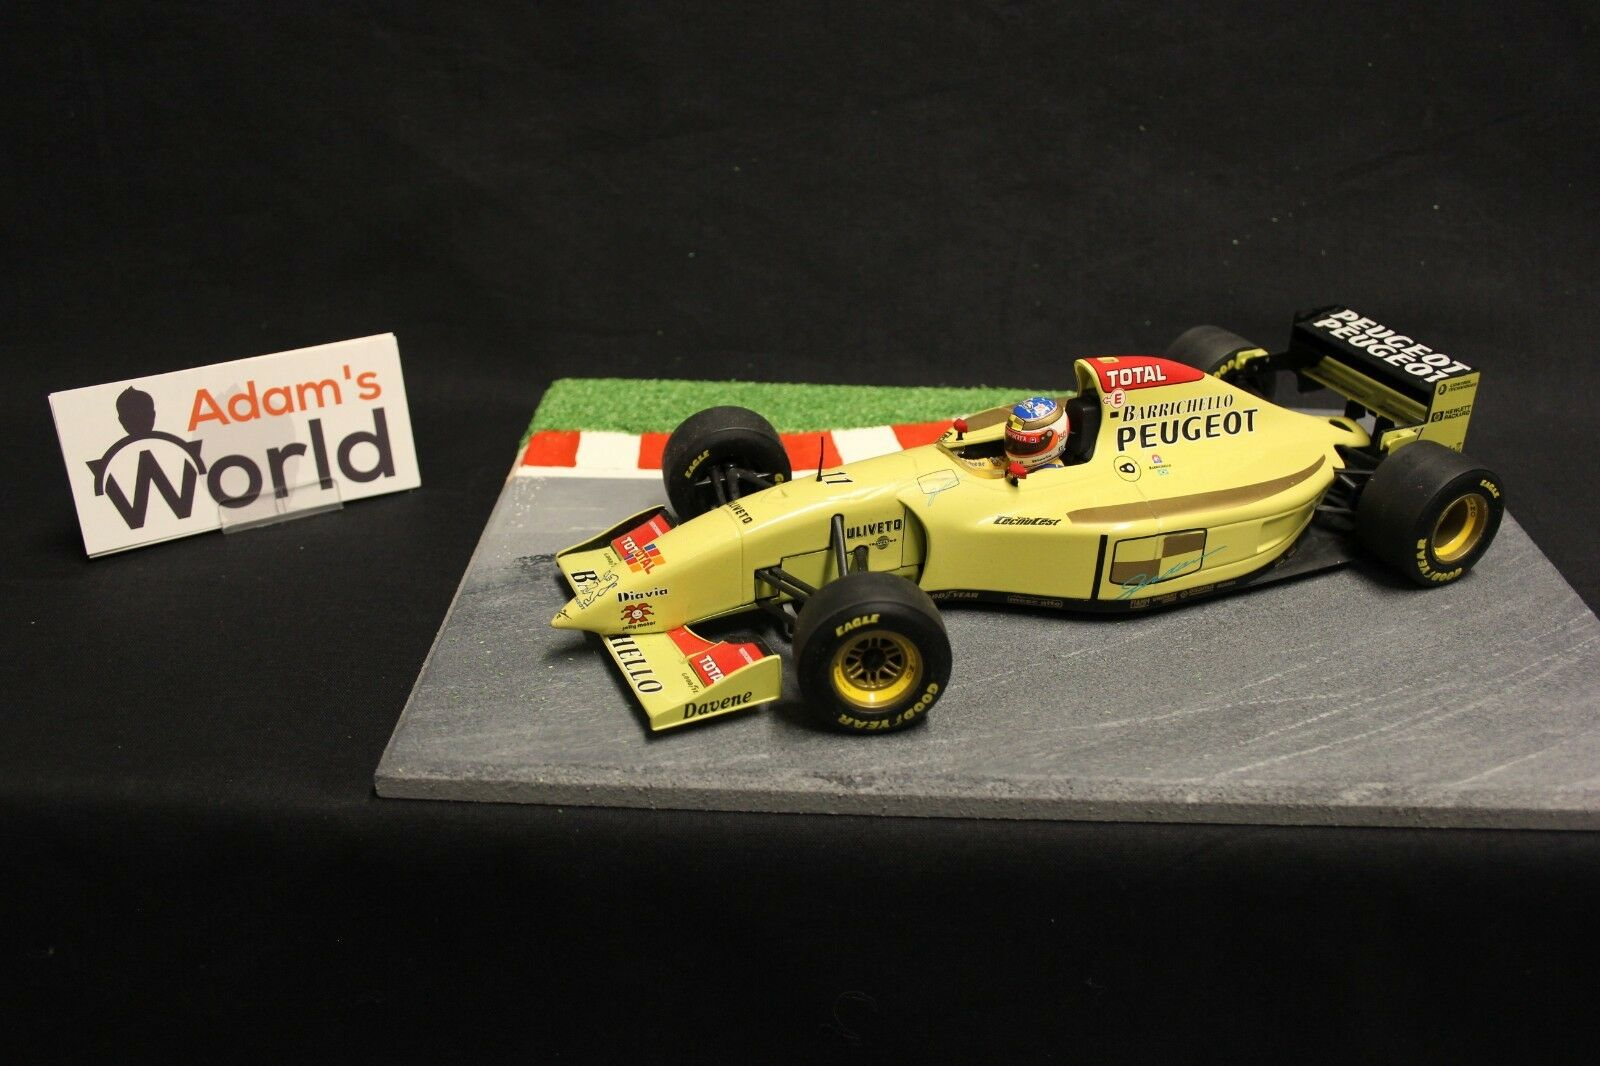 Minichamps Jordan Peugeot Show car 1996 1 18  11 Rubens Barrichello (BRA) (F1NB)